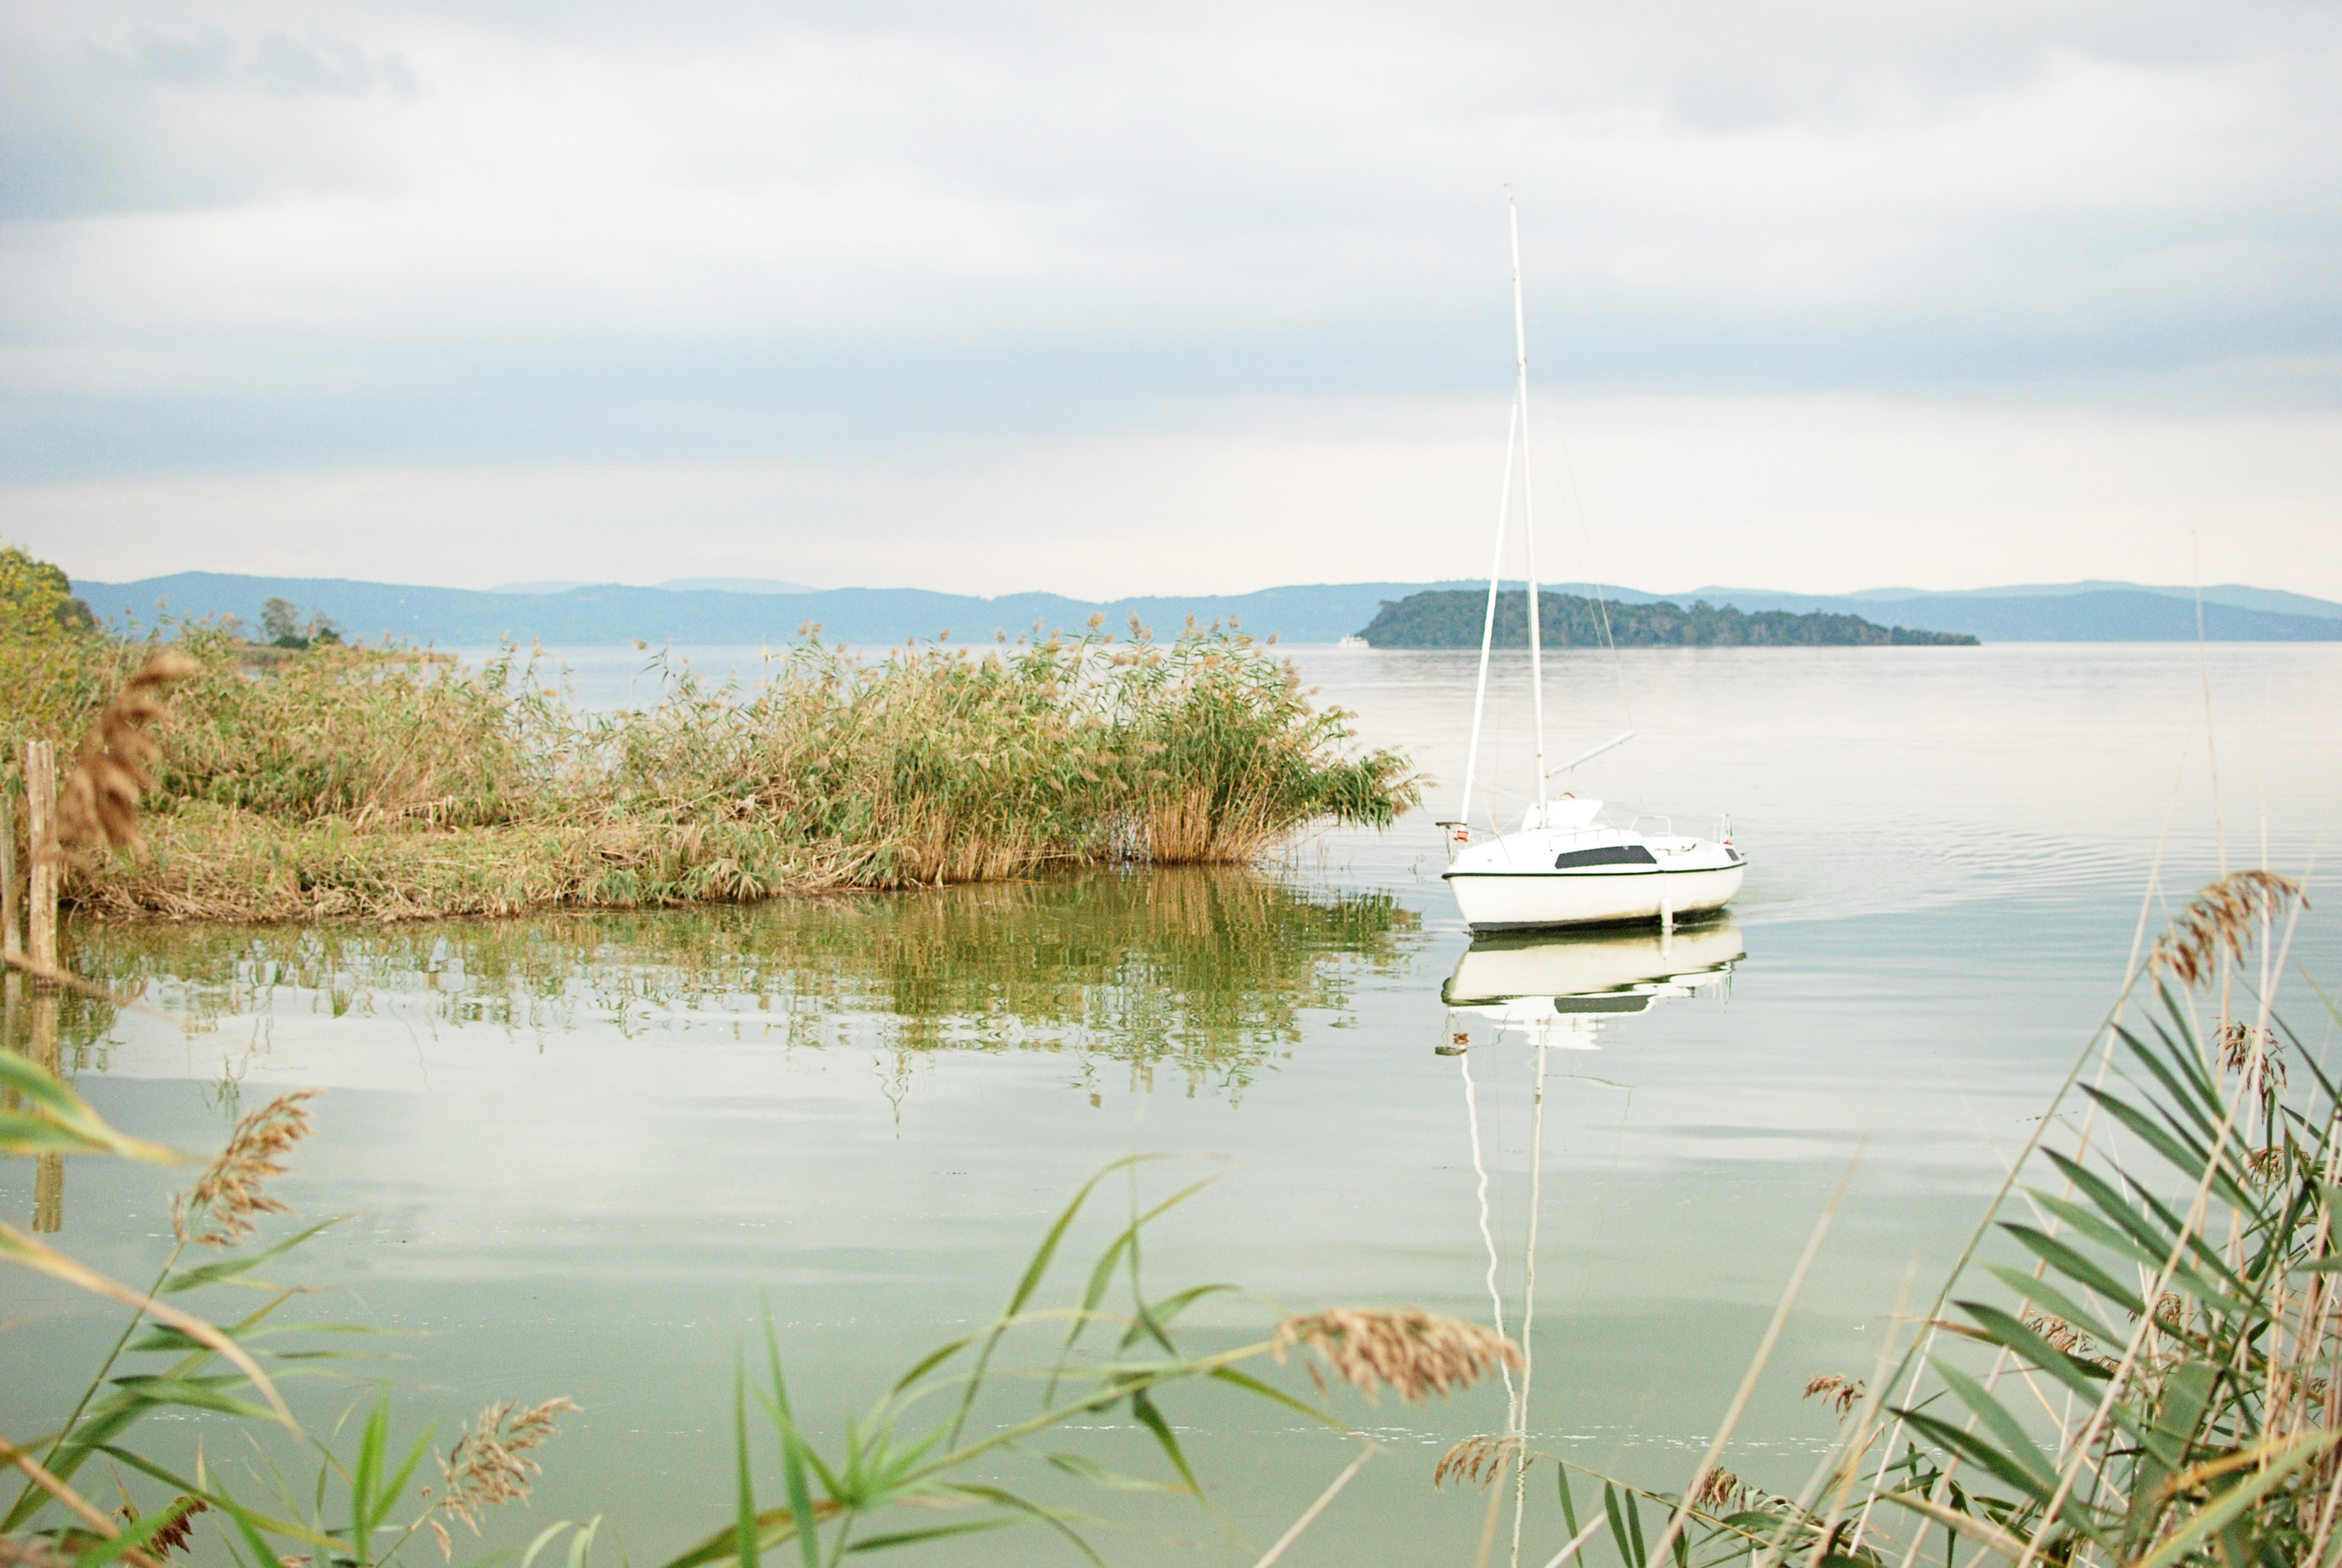 Lago Trasimeno, Italy